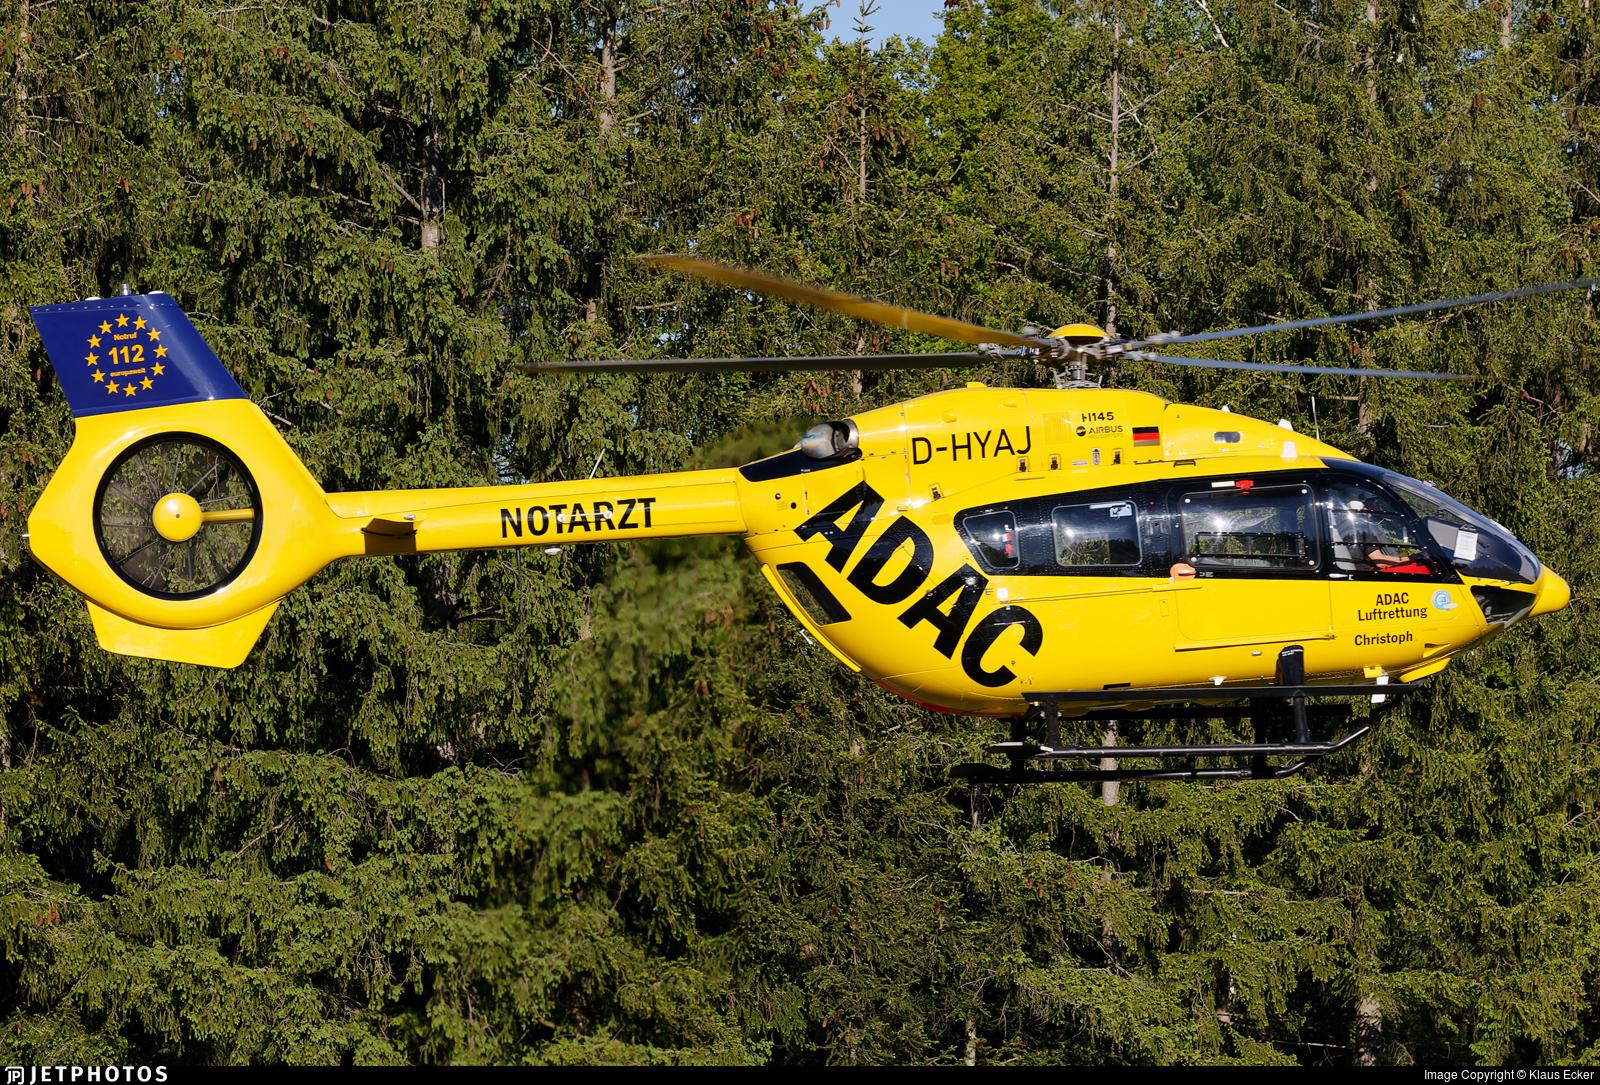 D-HYAJ - Airbus Helicopters H145 - ADAC Luftrettung